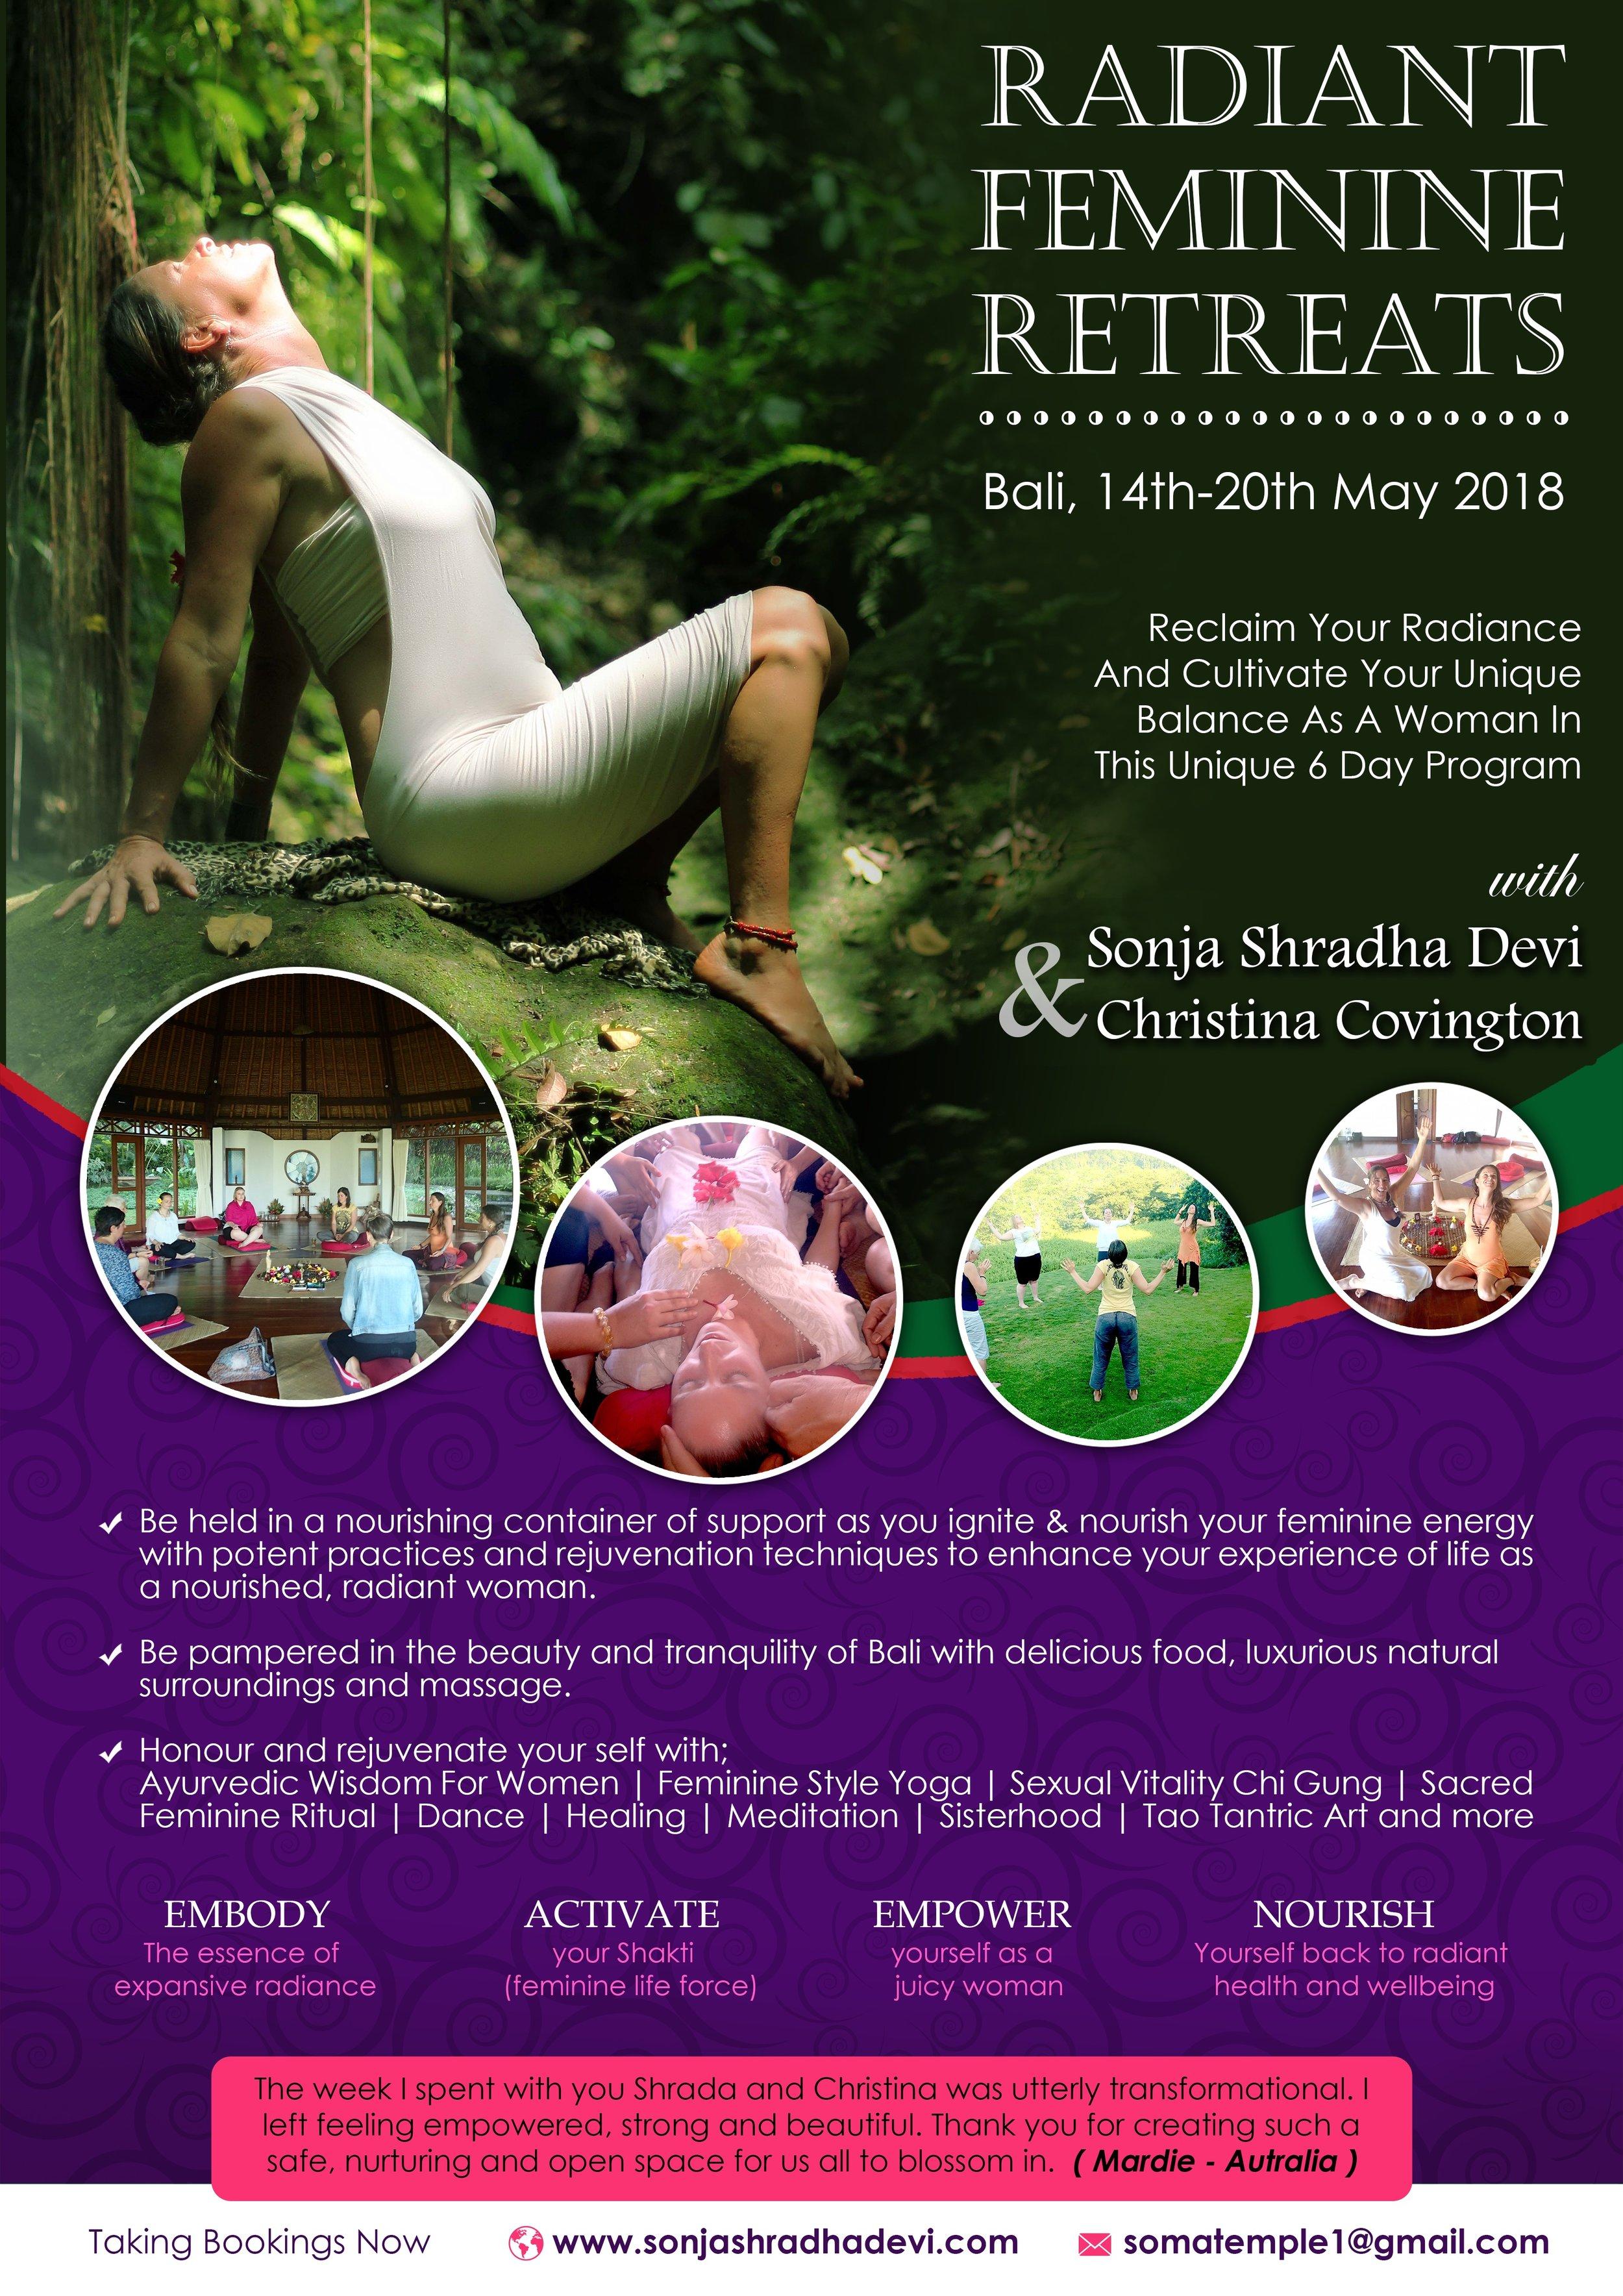 Radiant_feminine_retreats.jpg